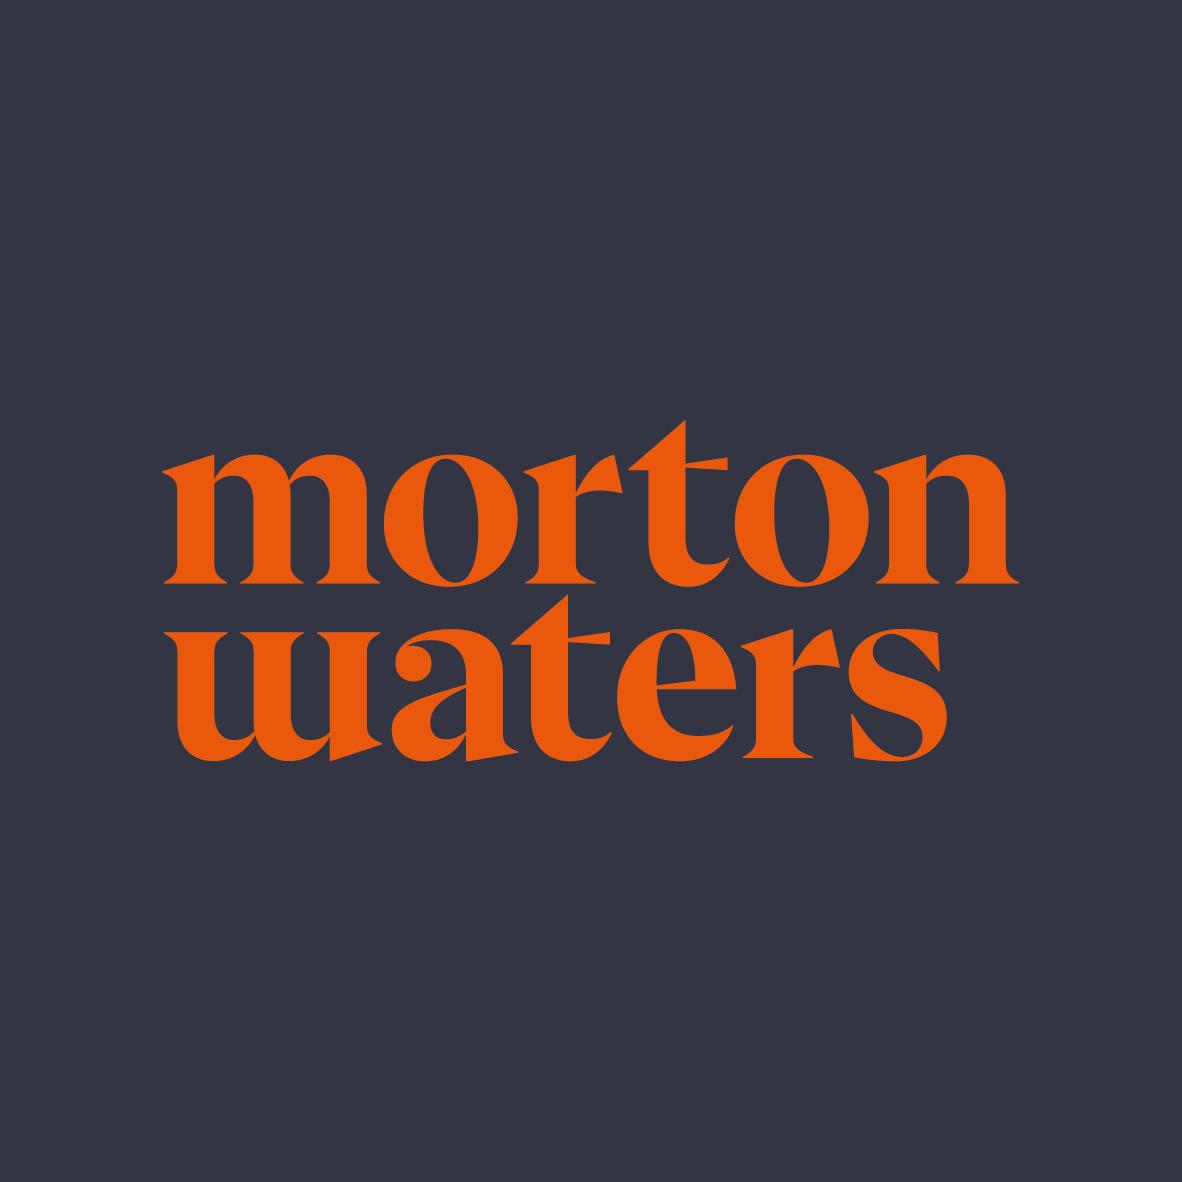 Morton Waters Logo